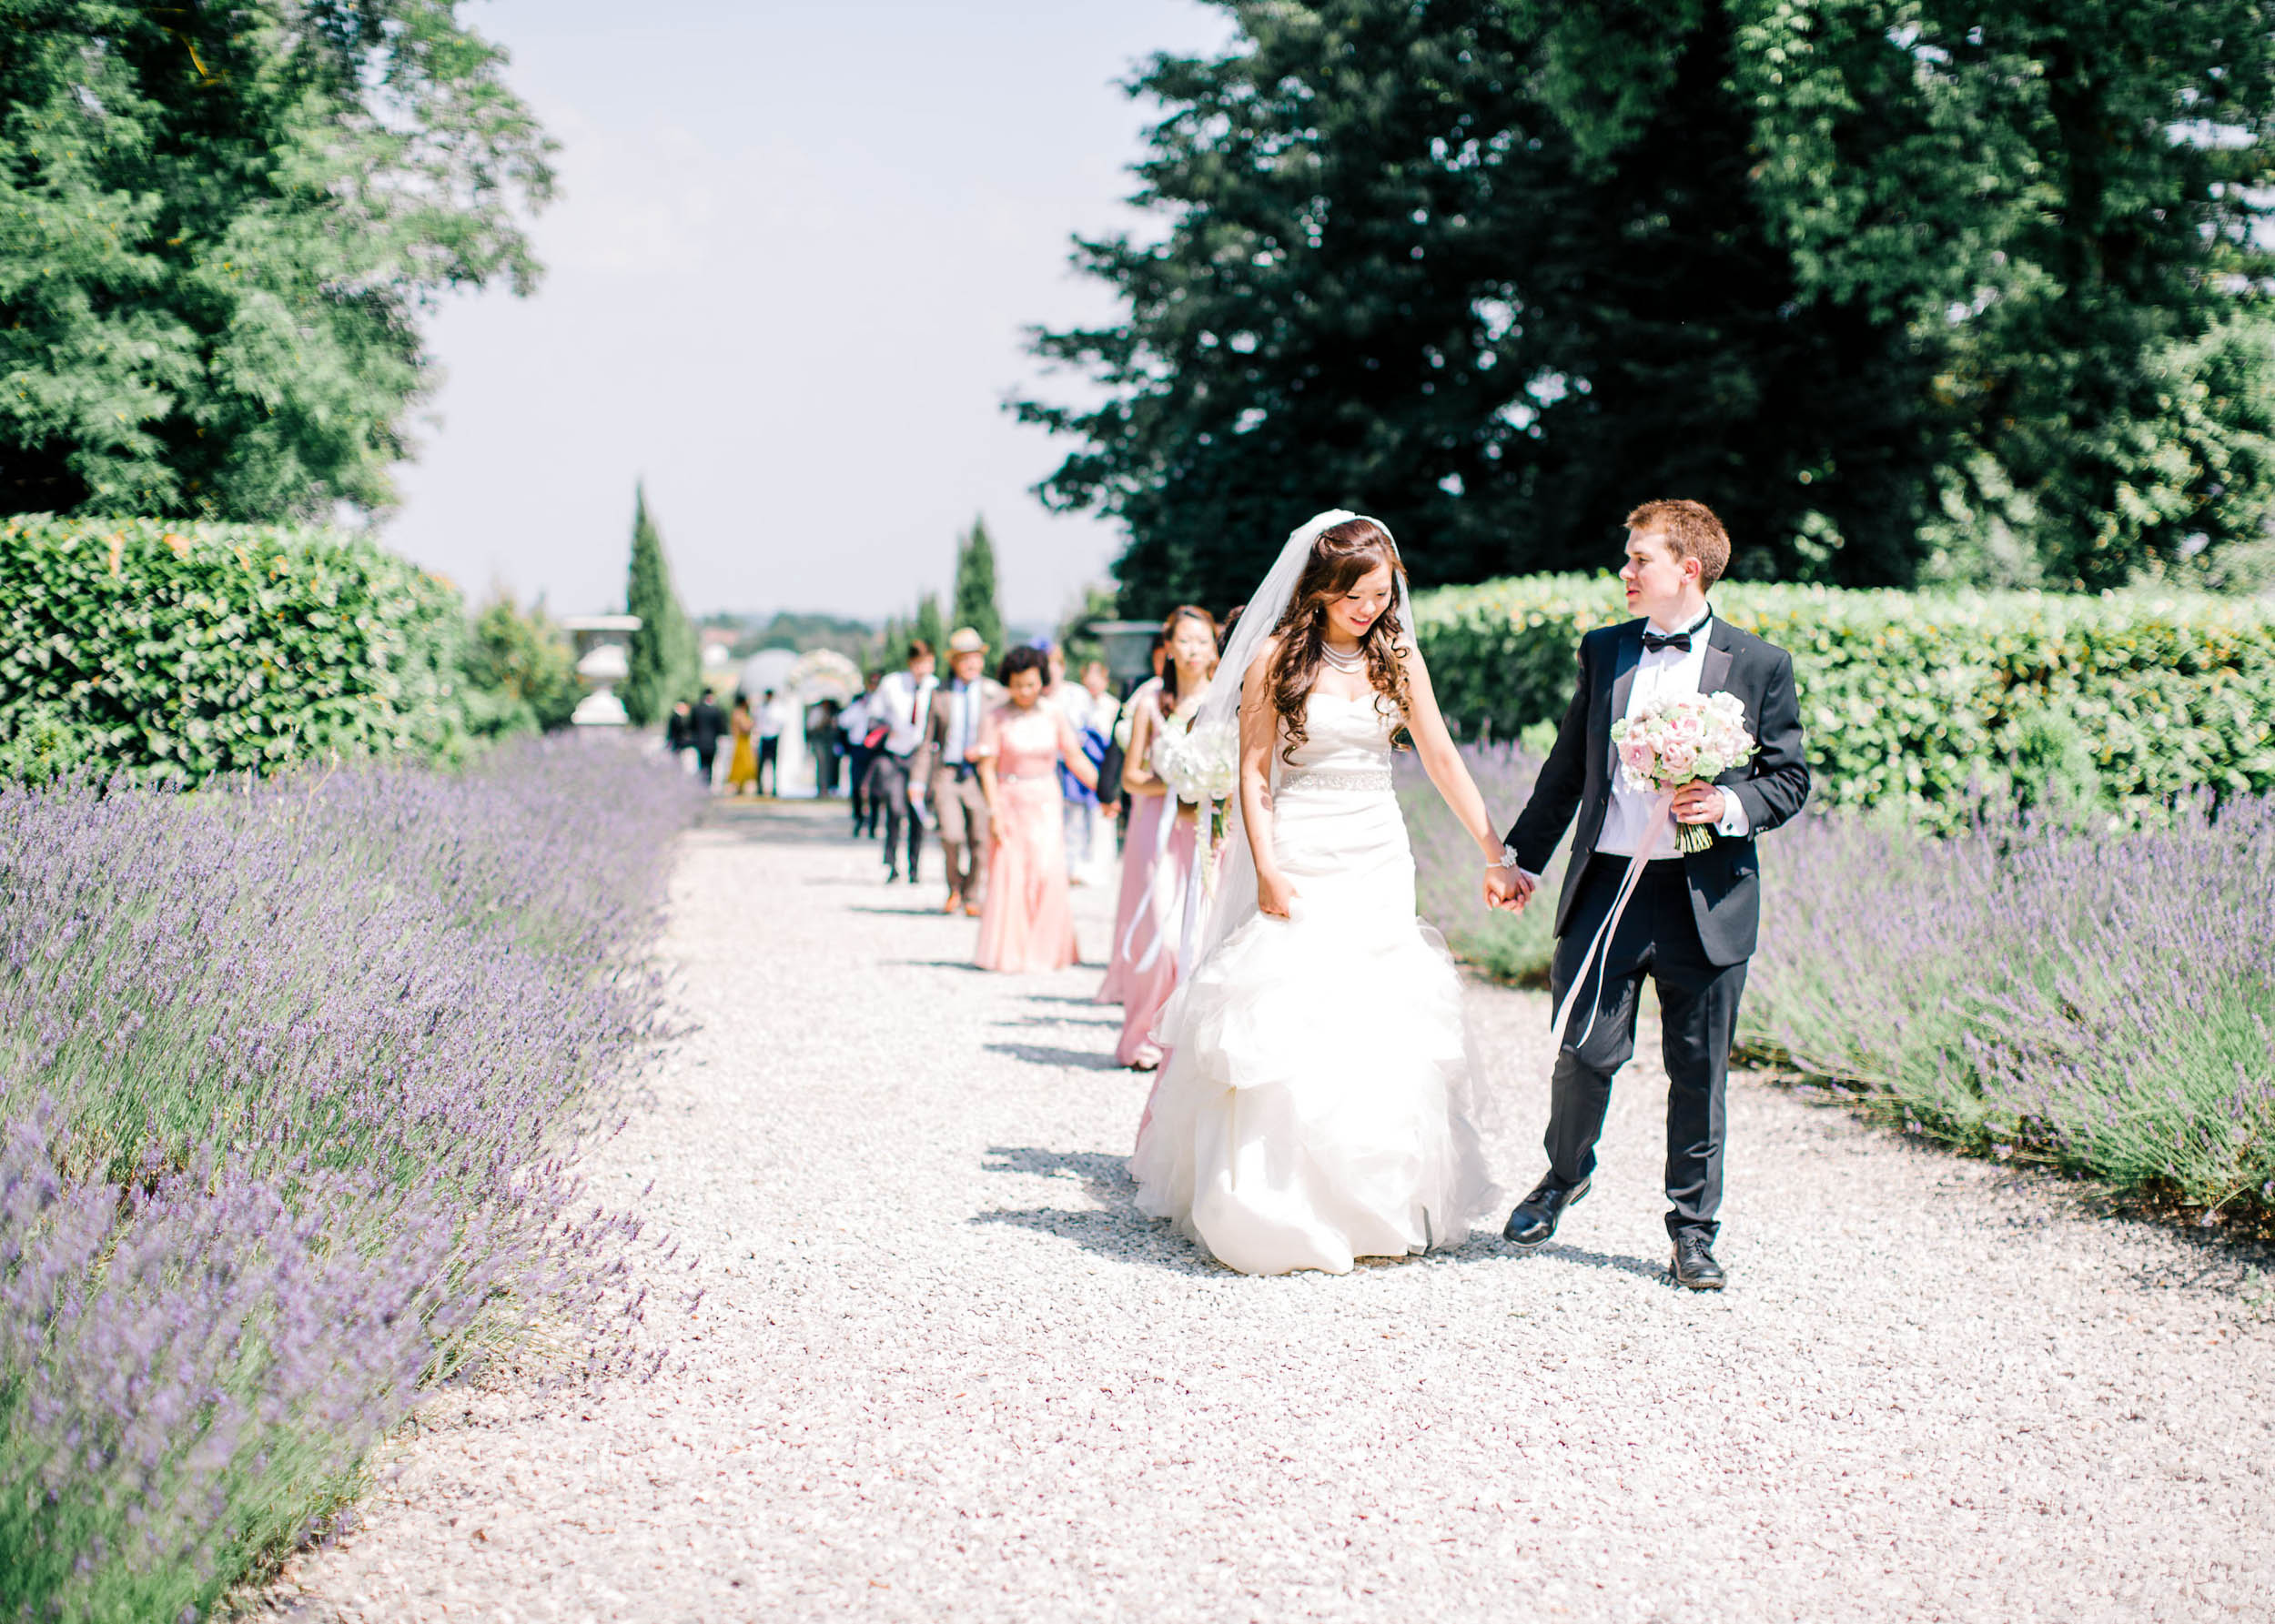 Amy O'Boyle Photography- Destination & UK Fine Art Film Wedding Photographer- Chateau La Durantie Wedding-15.jpg